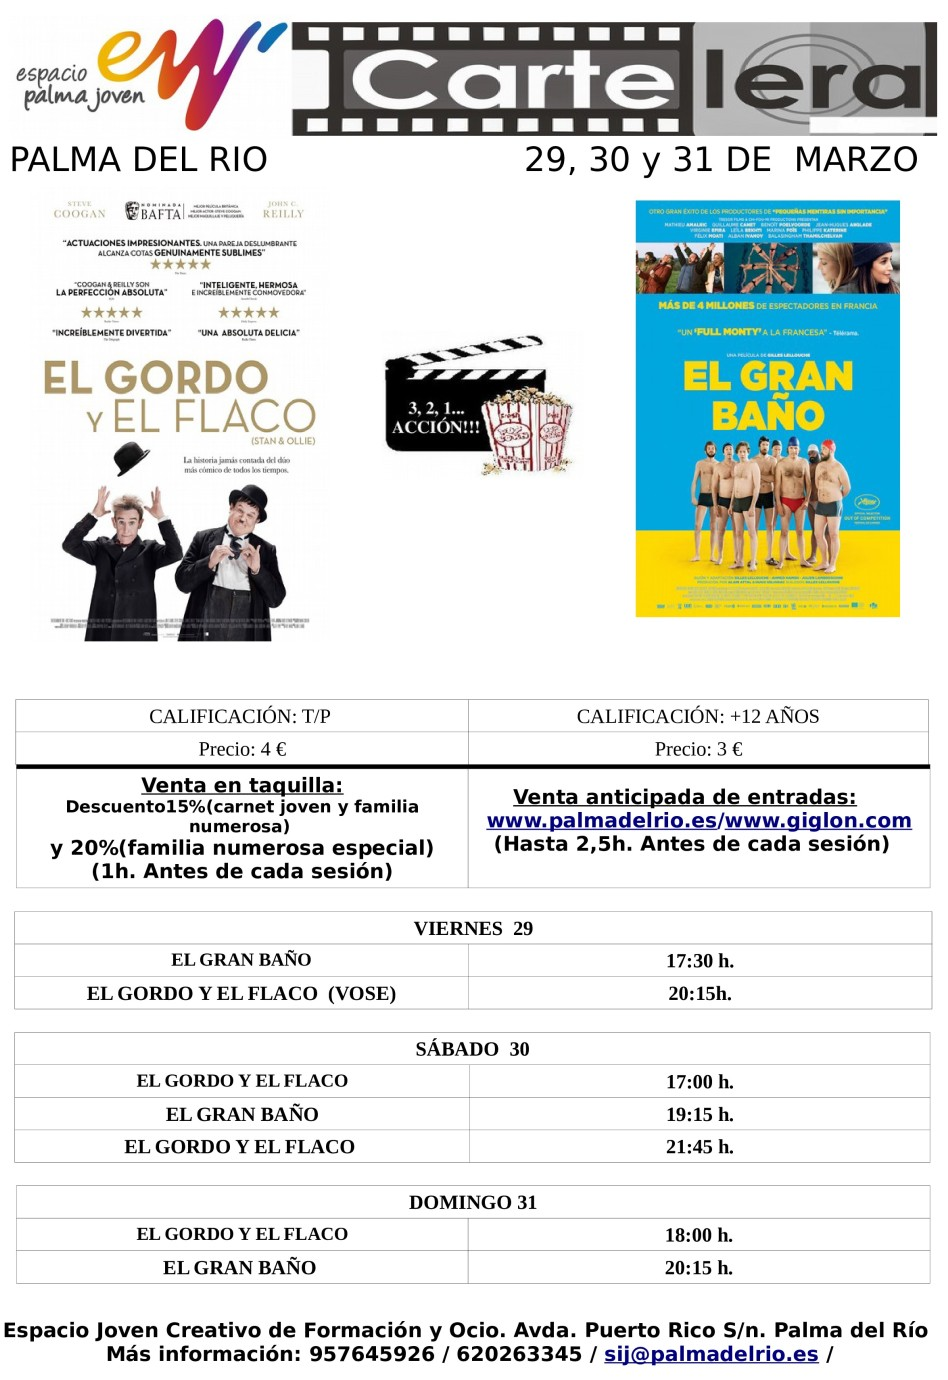 https://www.palmadelrio.es/sites/default/files/cine_29.30.31_marzo_2019.jpg